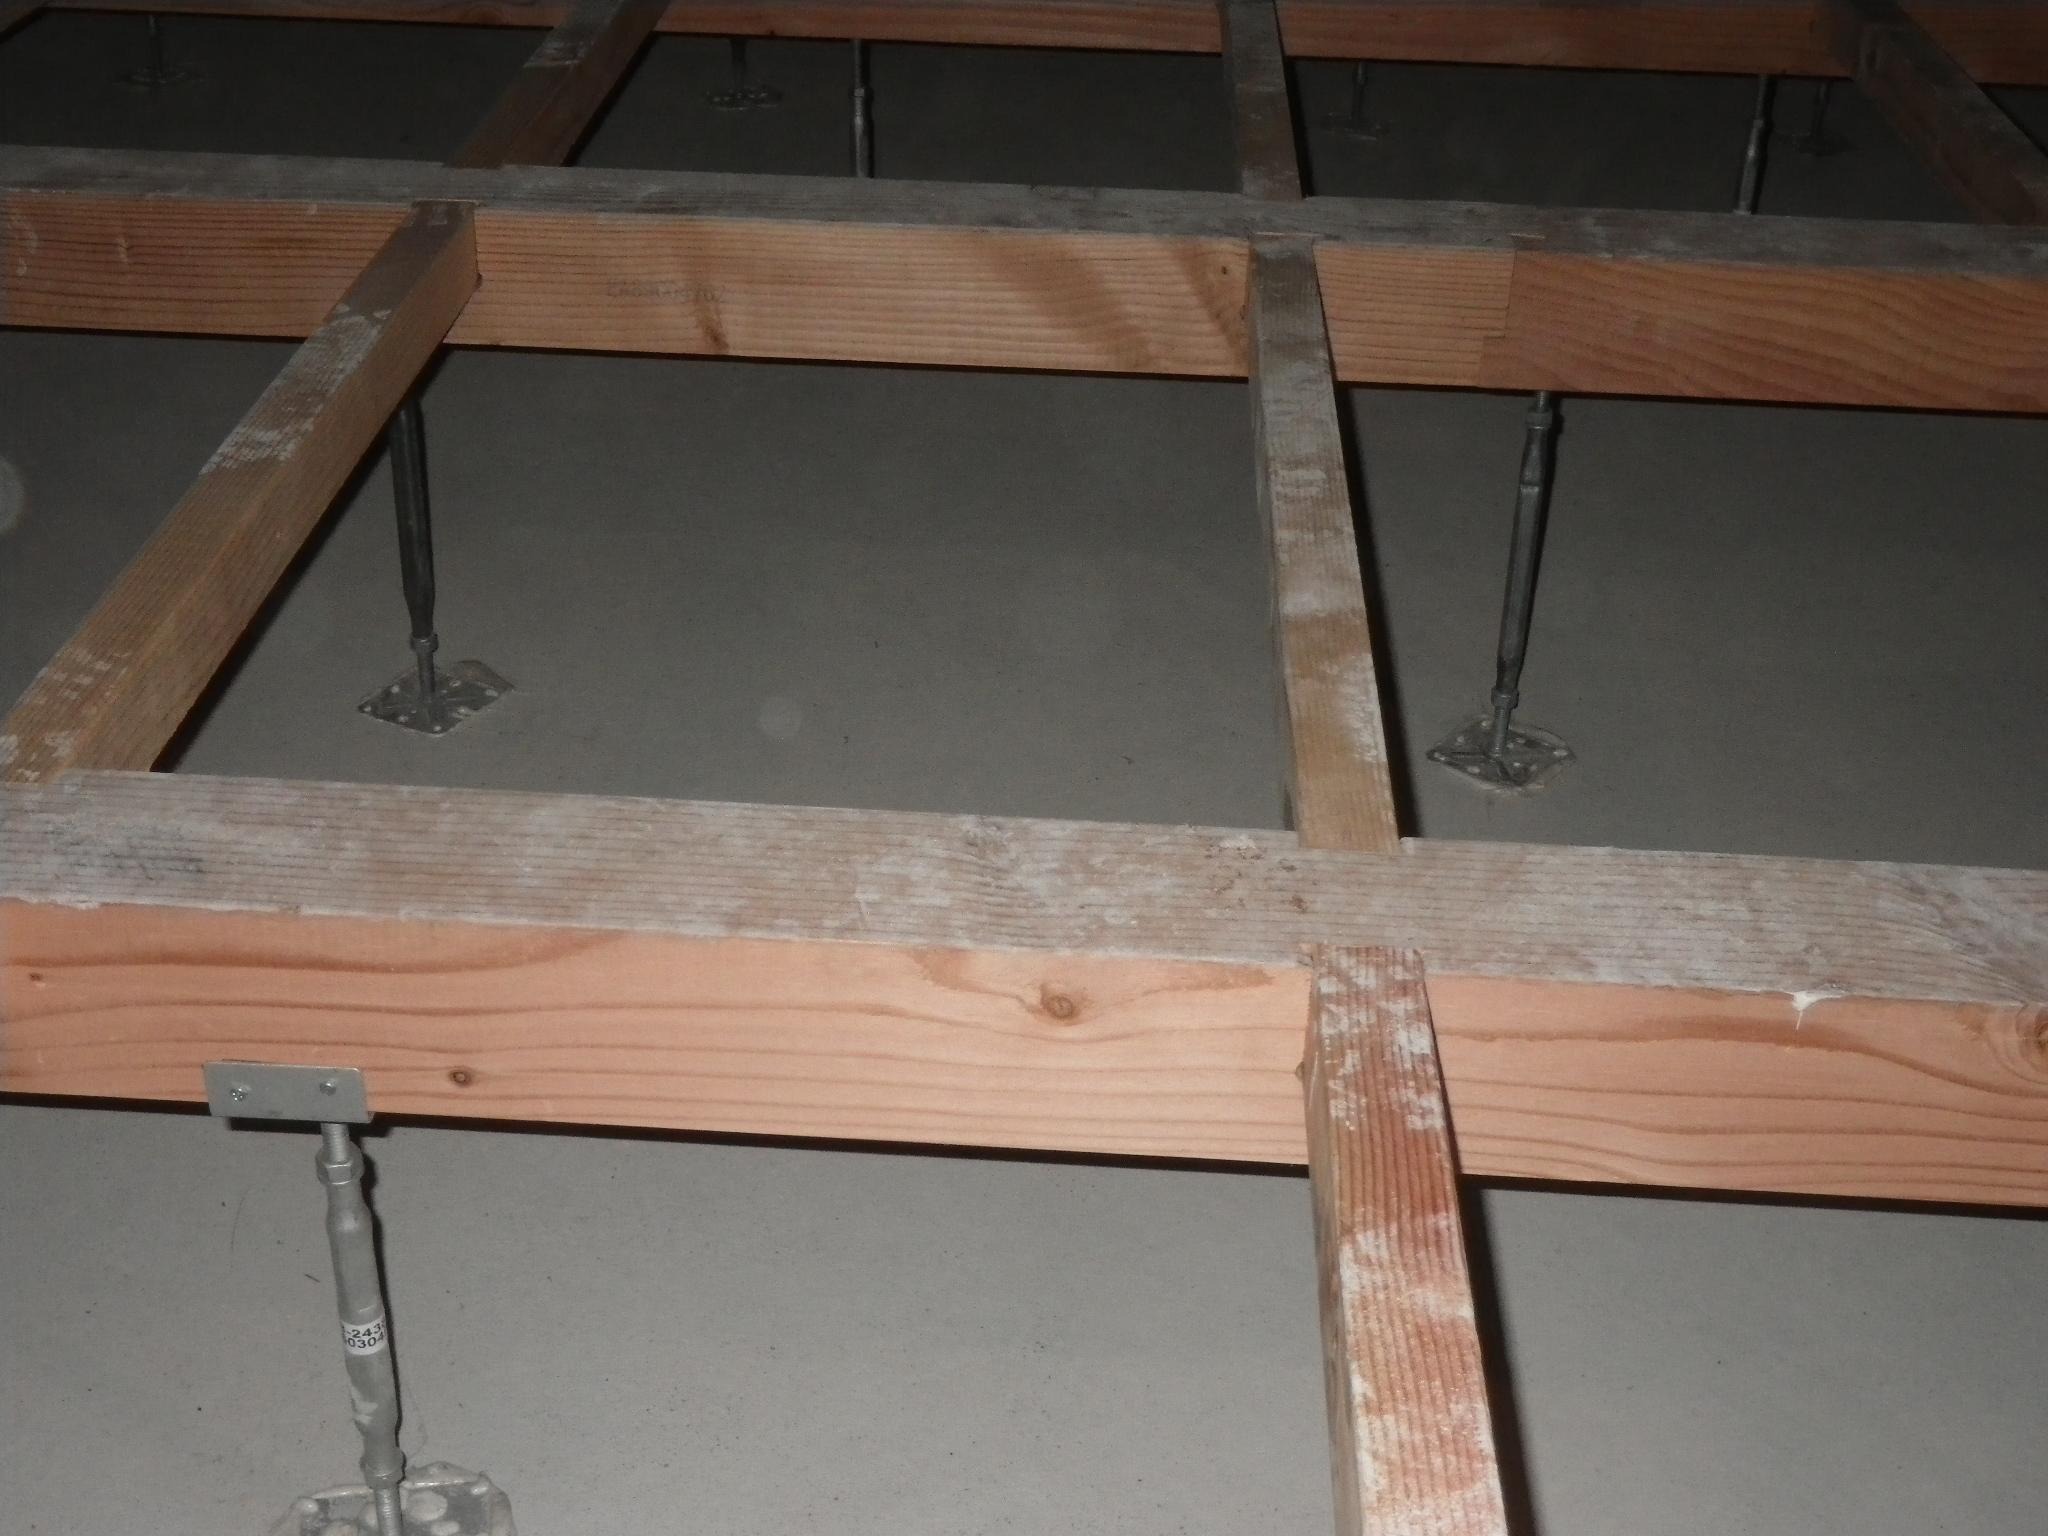 木造軸組工法の現場管理(2)